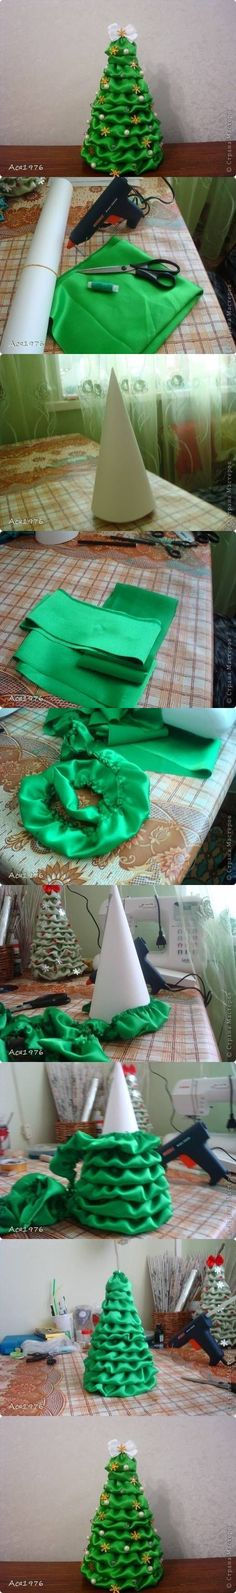 DIY Fabric Christmas Tree DIY Projects